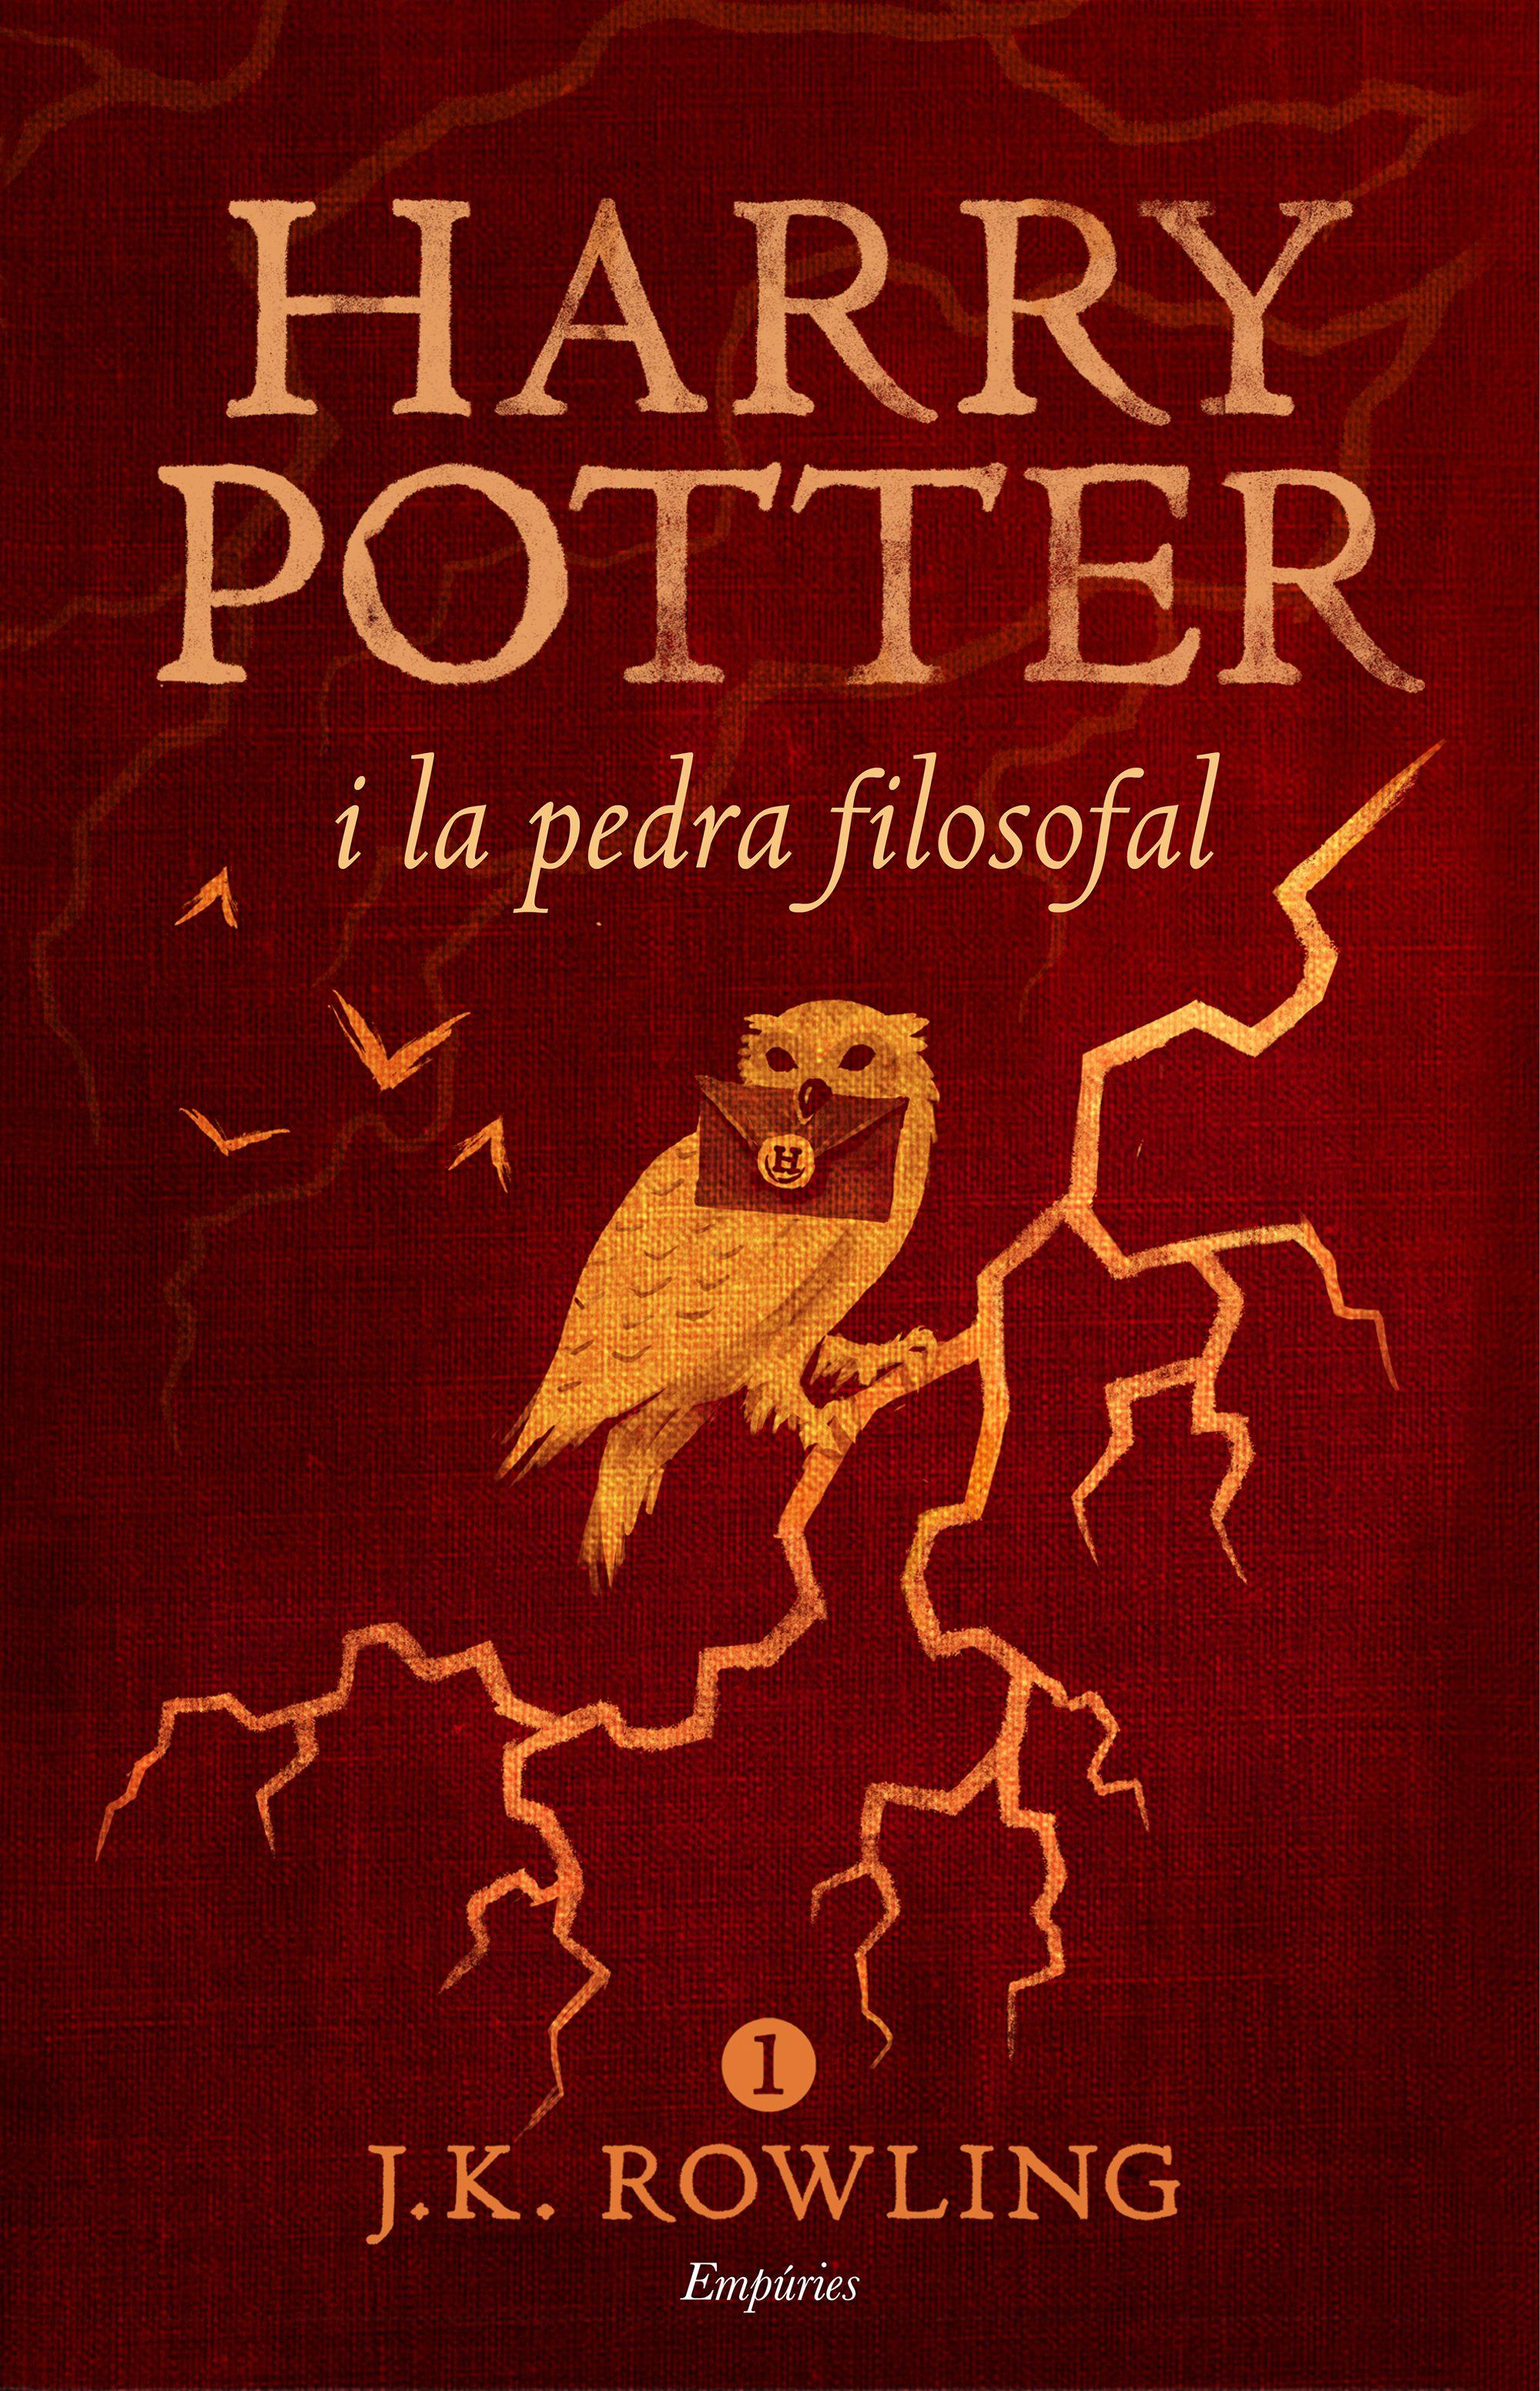 Harry Potter É A Pedra Filosofal with regard to harry potter i la pedra filosofal (rÚstica)   j.k. rowling